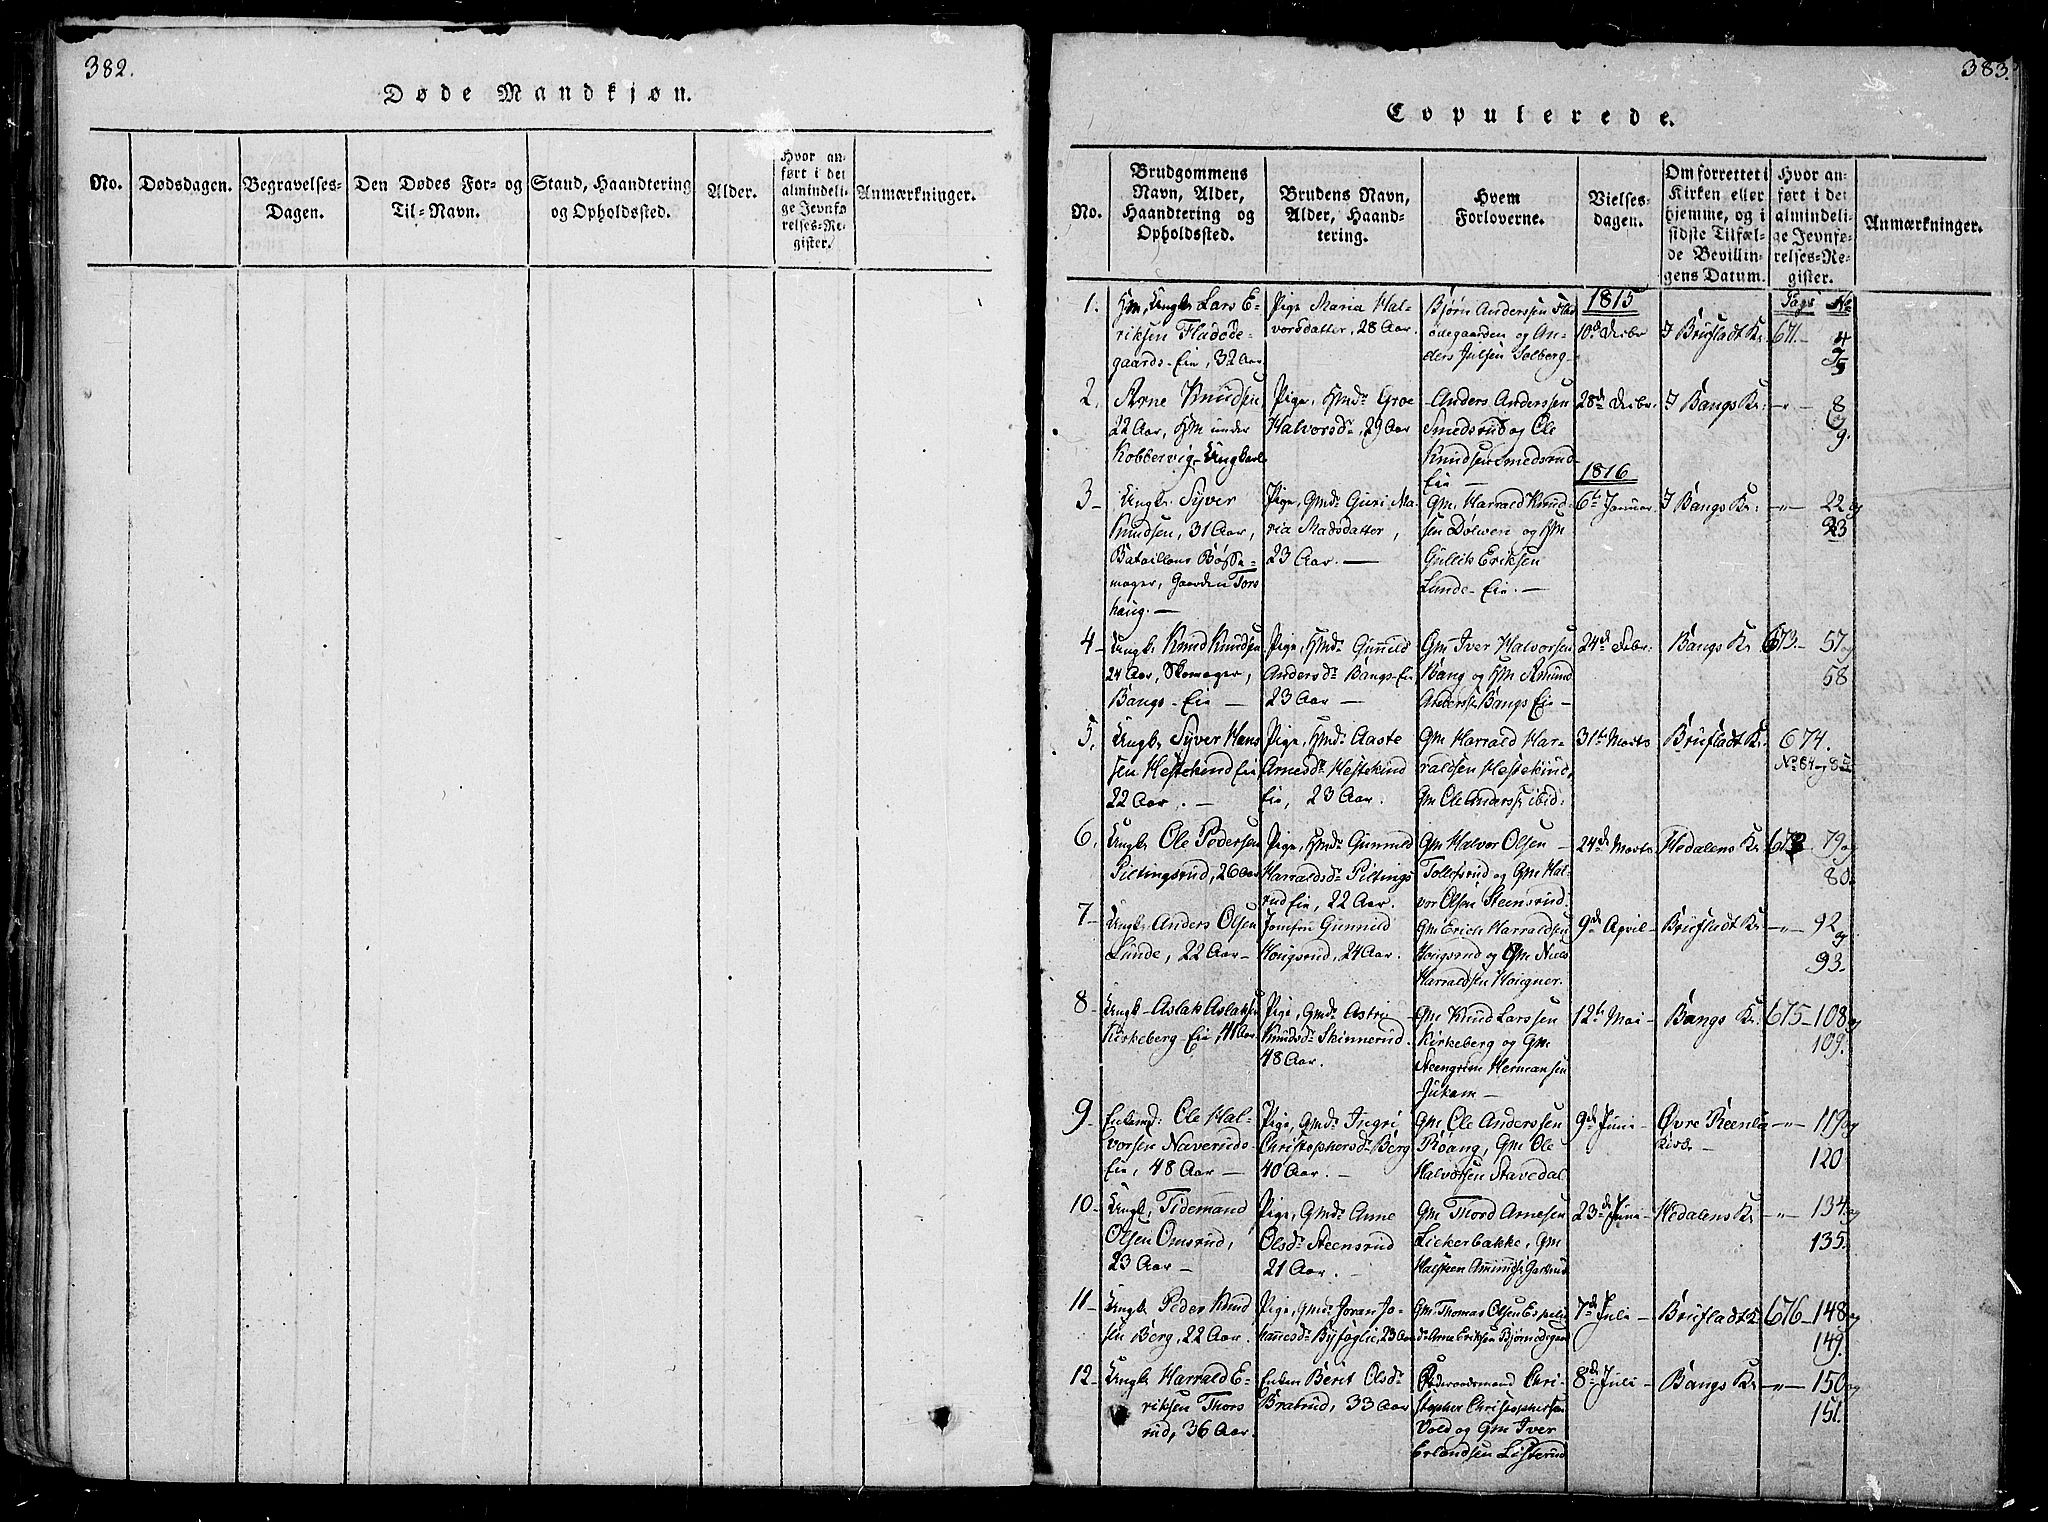 SAH, Sør-Aurdal prestekontor, Parish register (official) no. 2, 1815-1840, p. 382-383